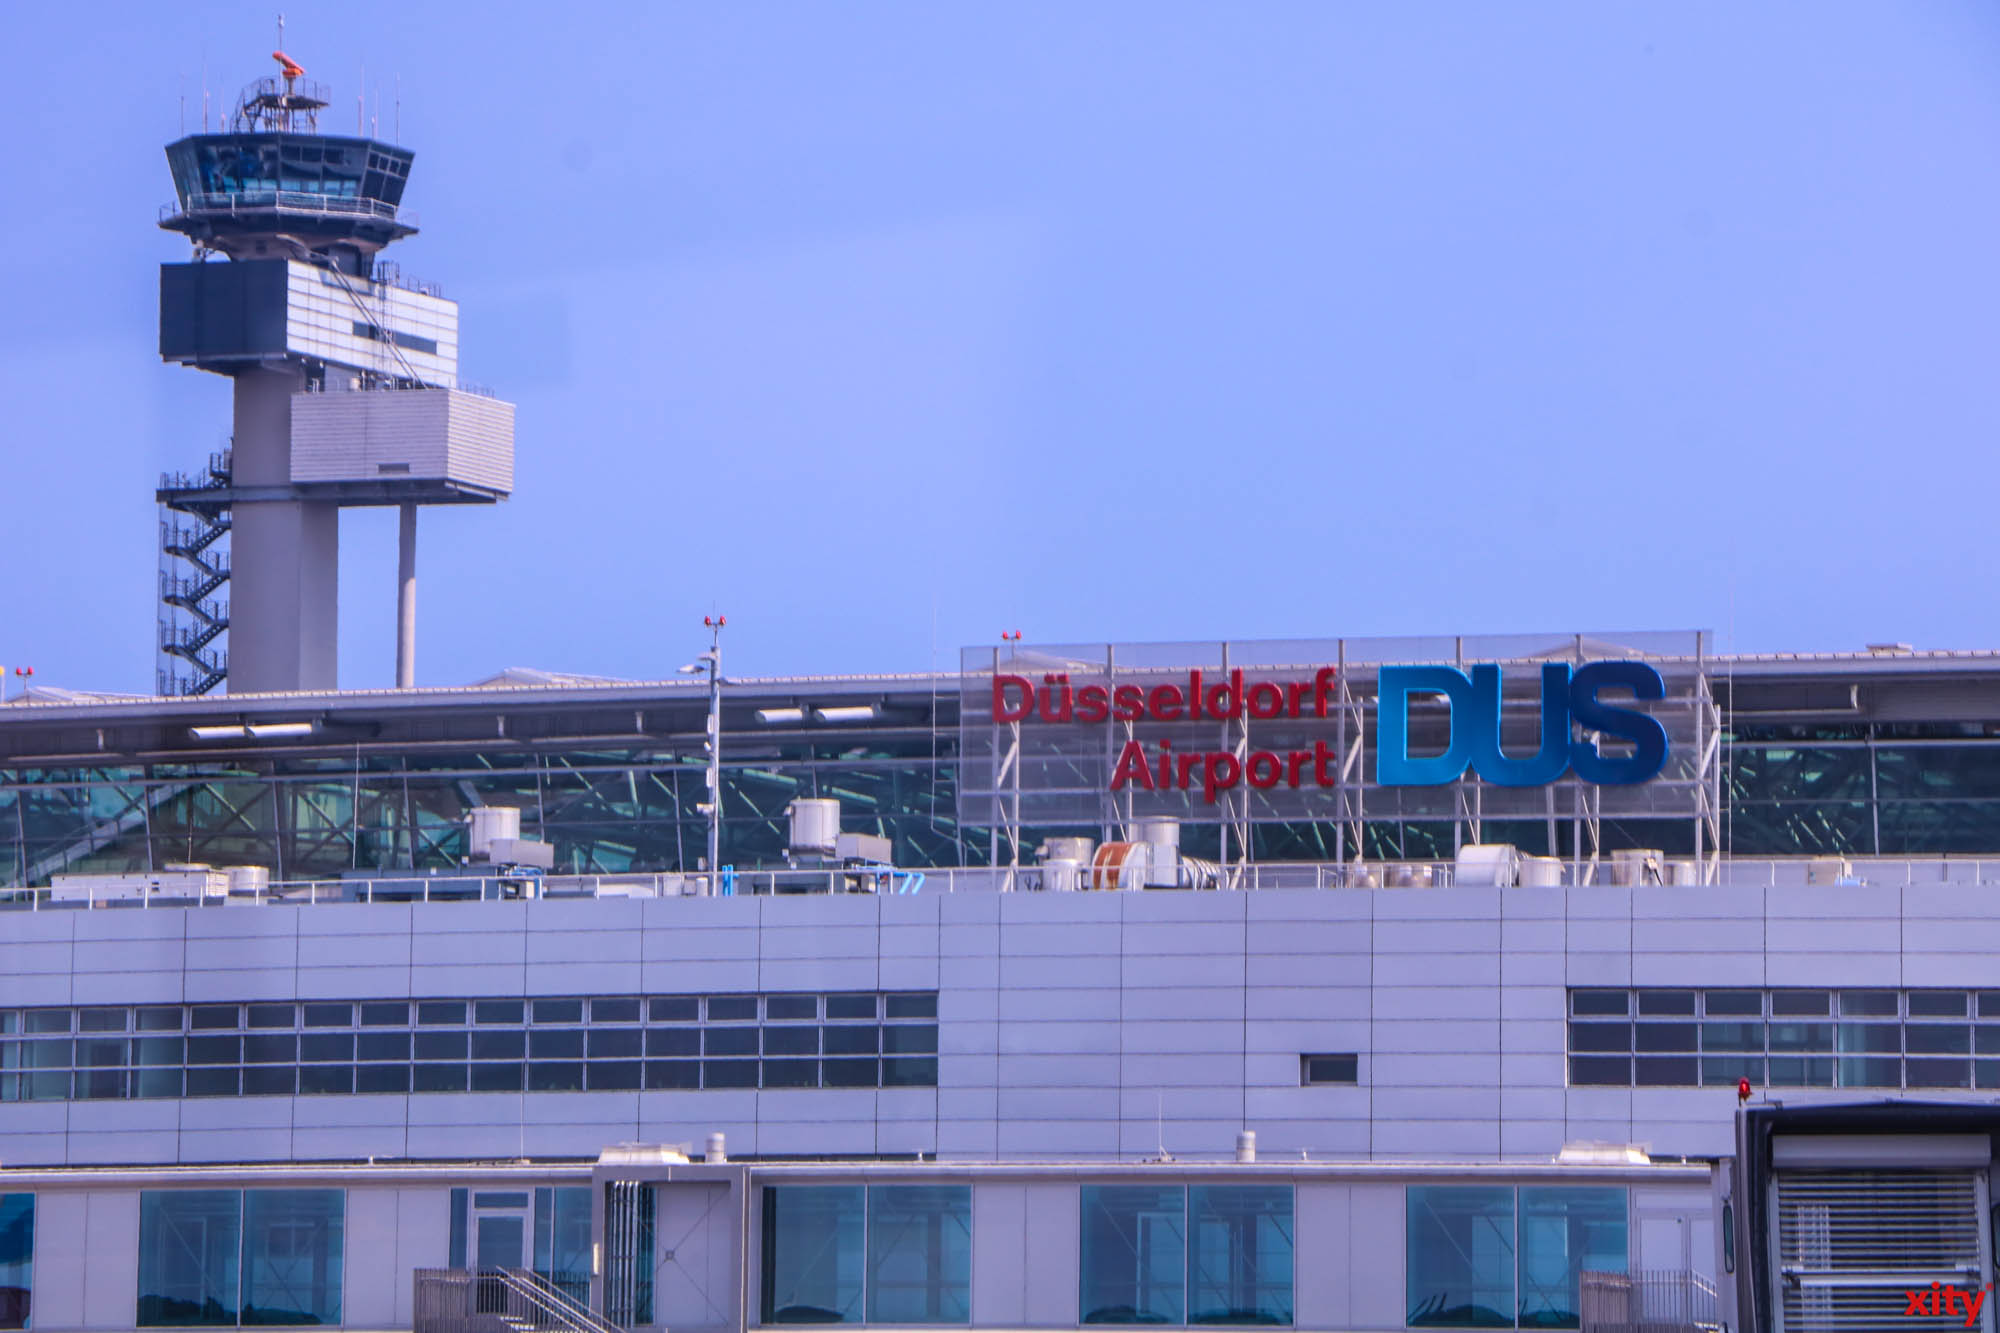 Flughafenverband sieht Flughäfen gegen Coronavirus gewappnet